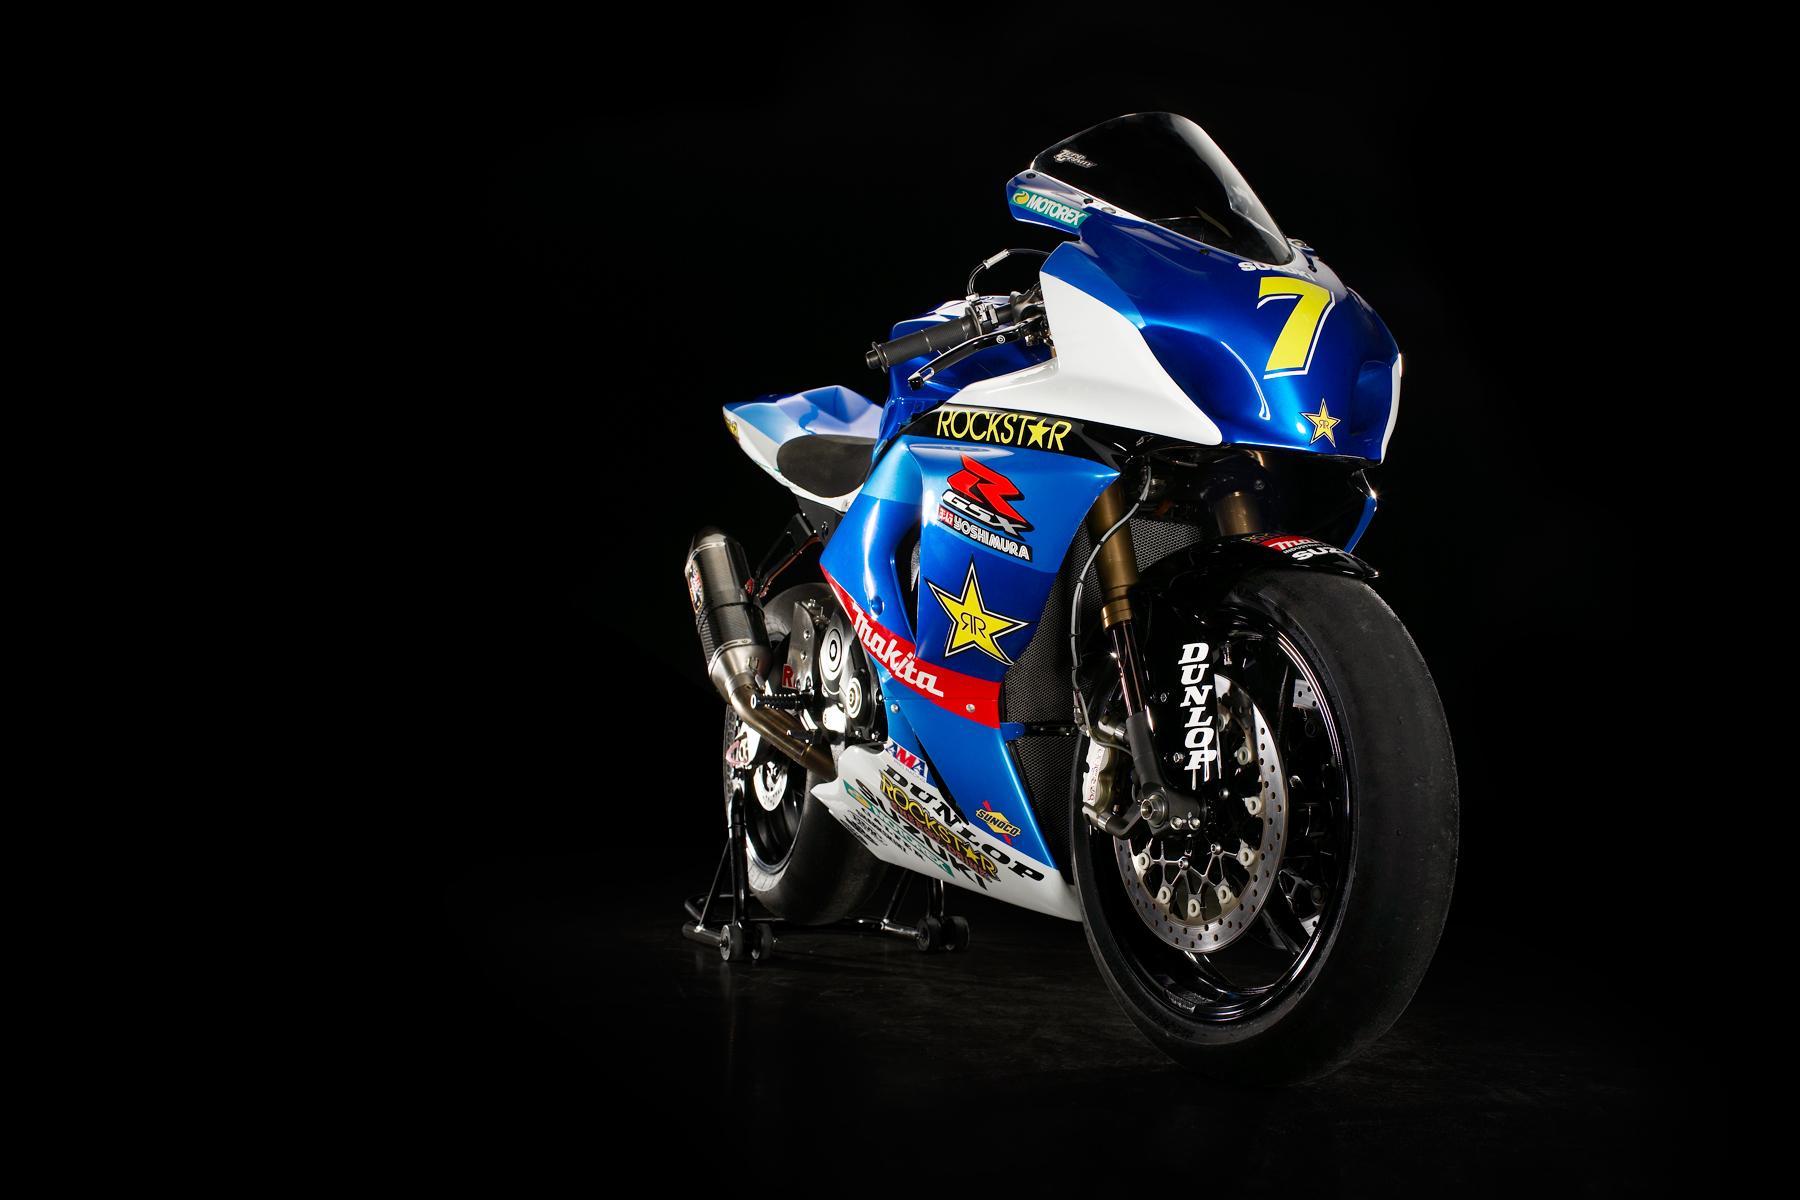 superbike_02_709.jpg